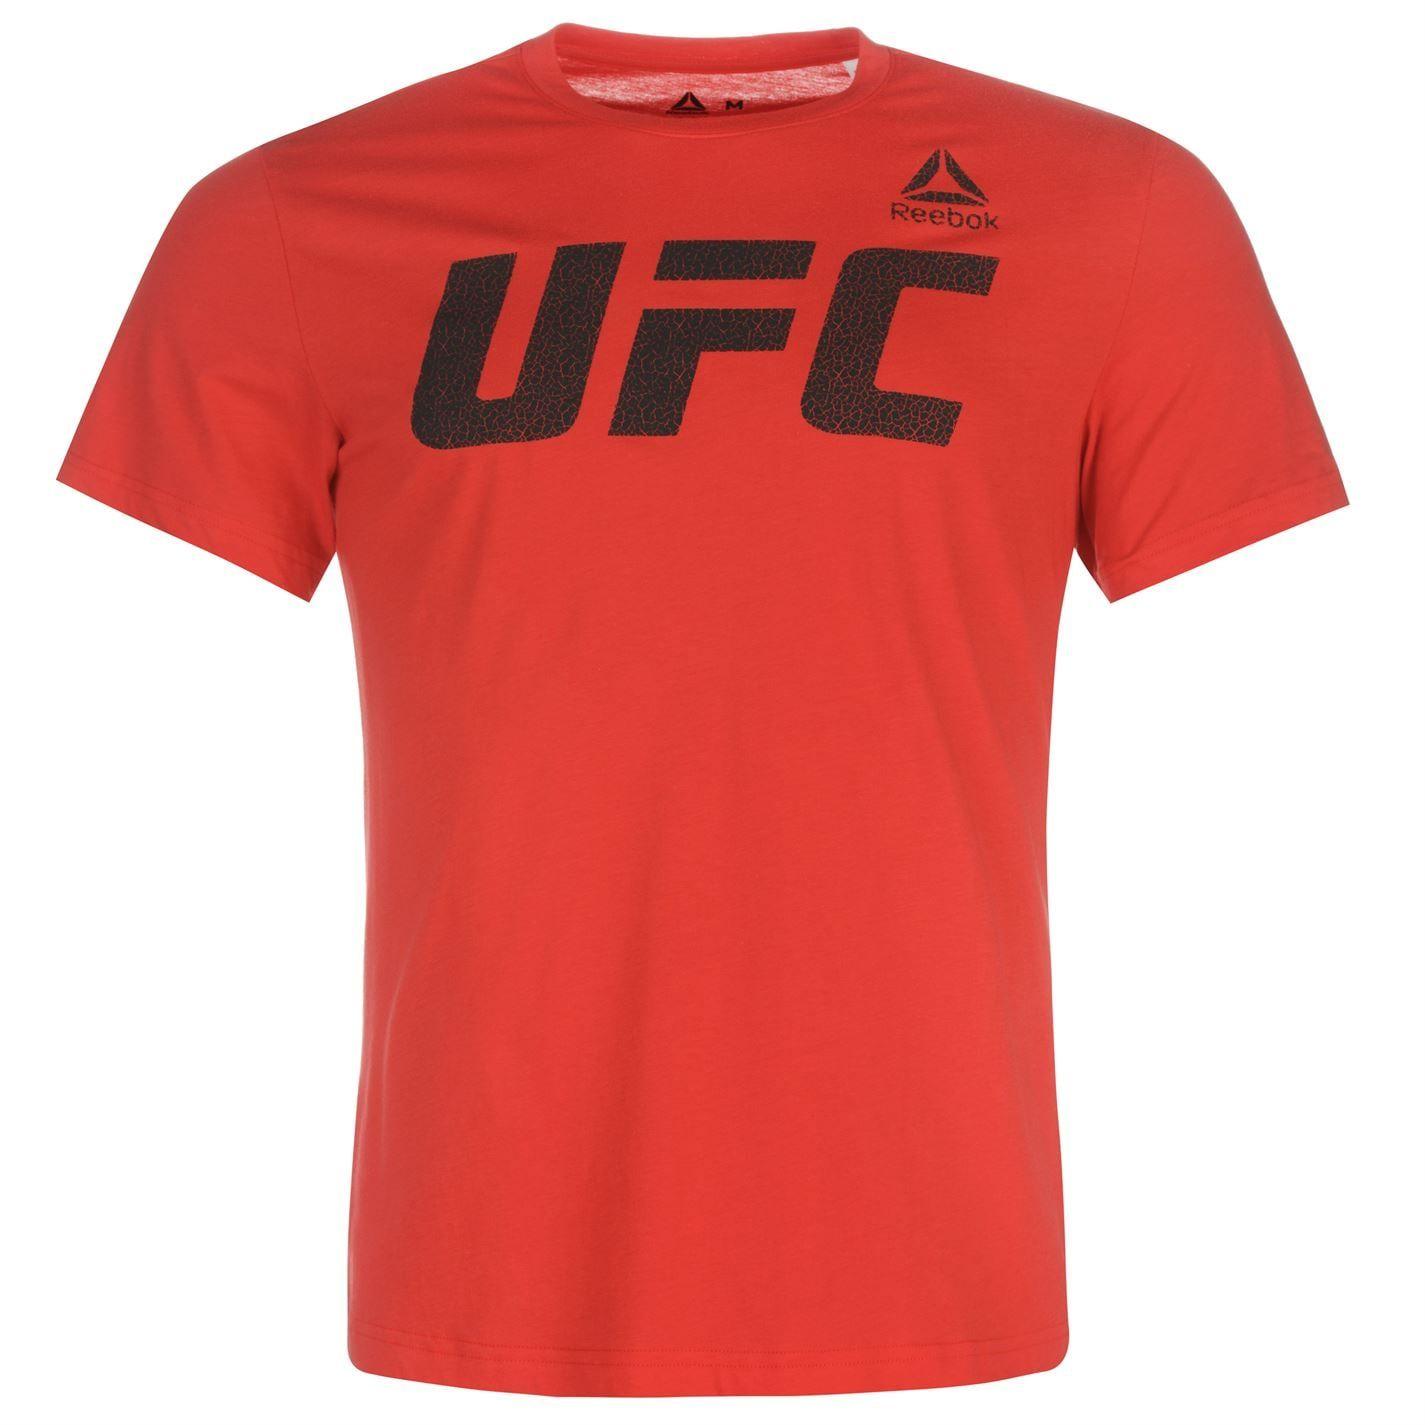 24f6cd70d9e9 Reebok UFC Κοντομάνικο μπλουζάκι ανδρικό (590521-59052108) - Woomie.gr